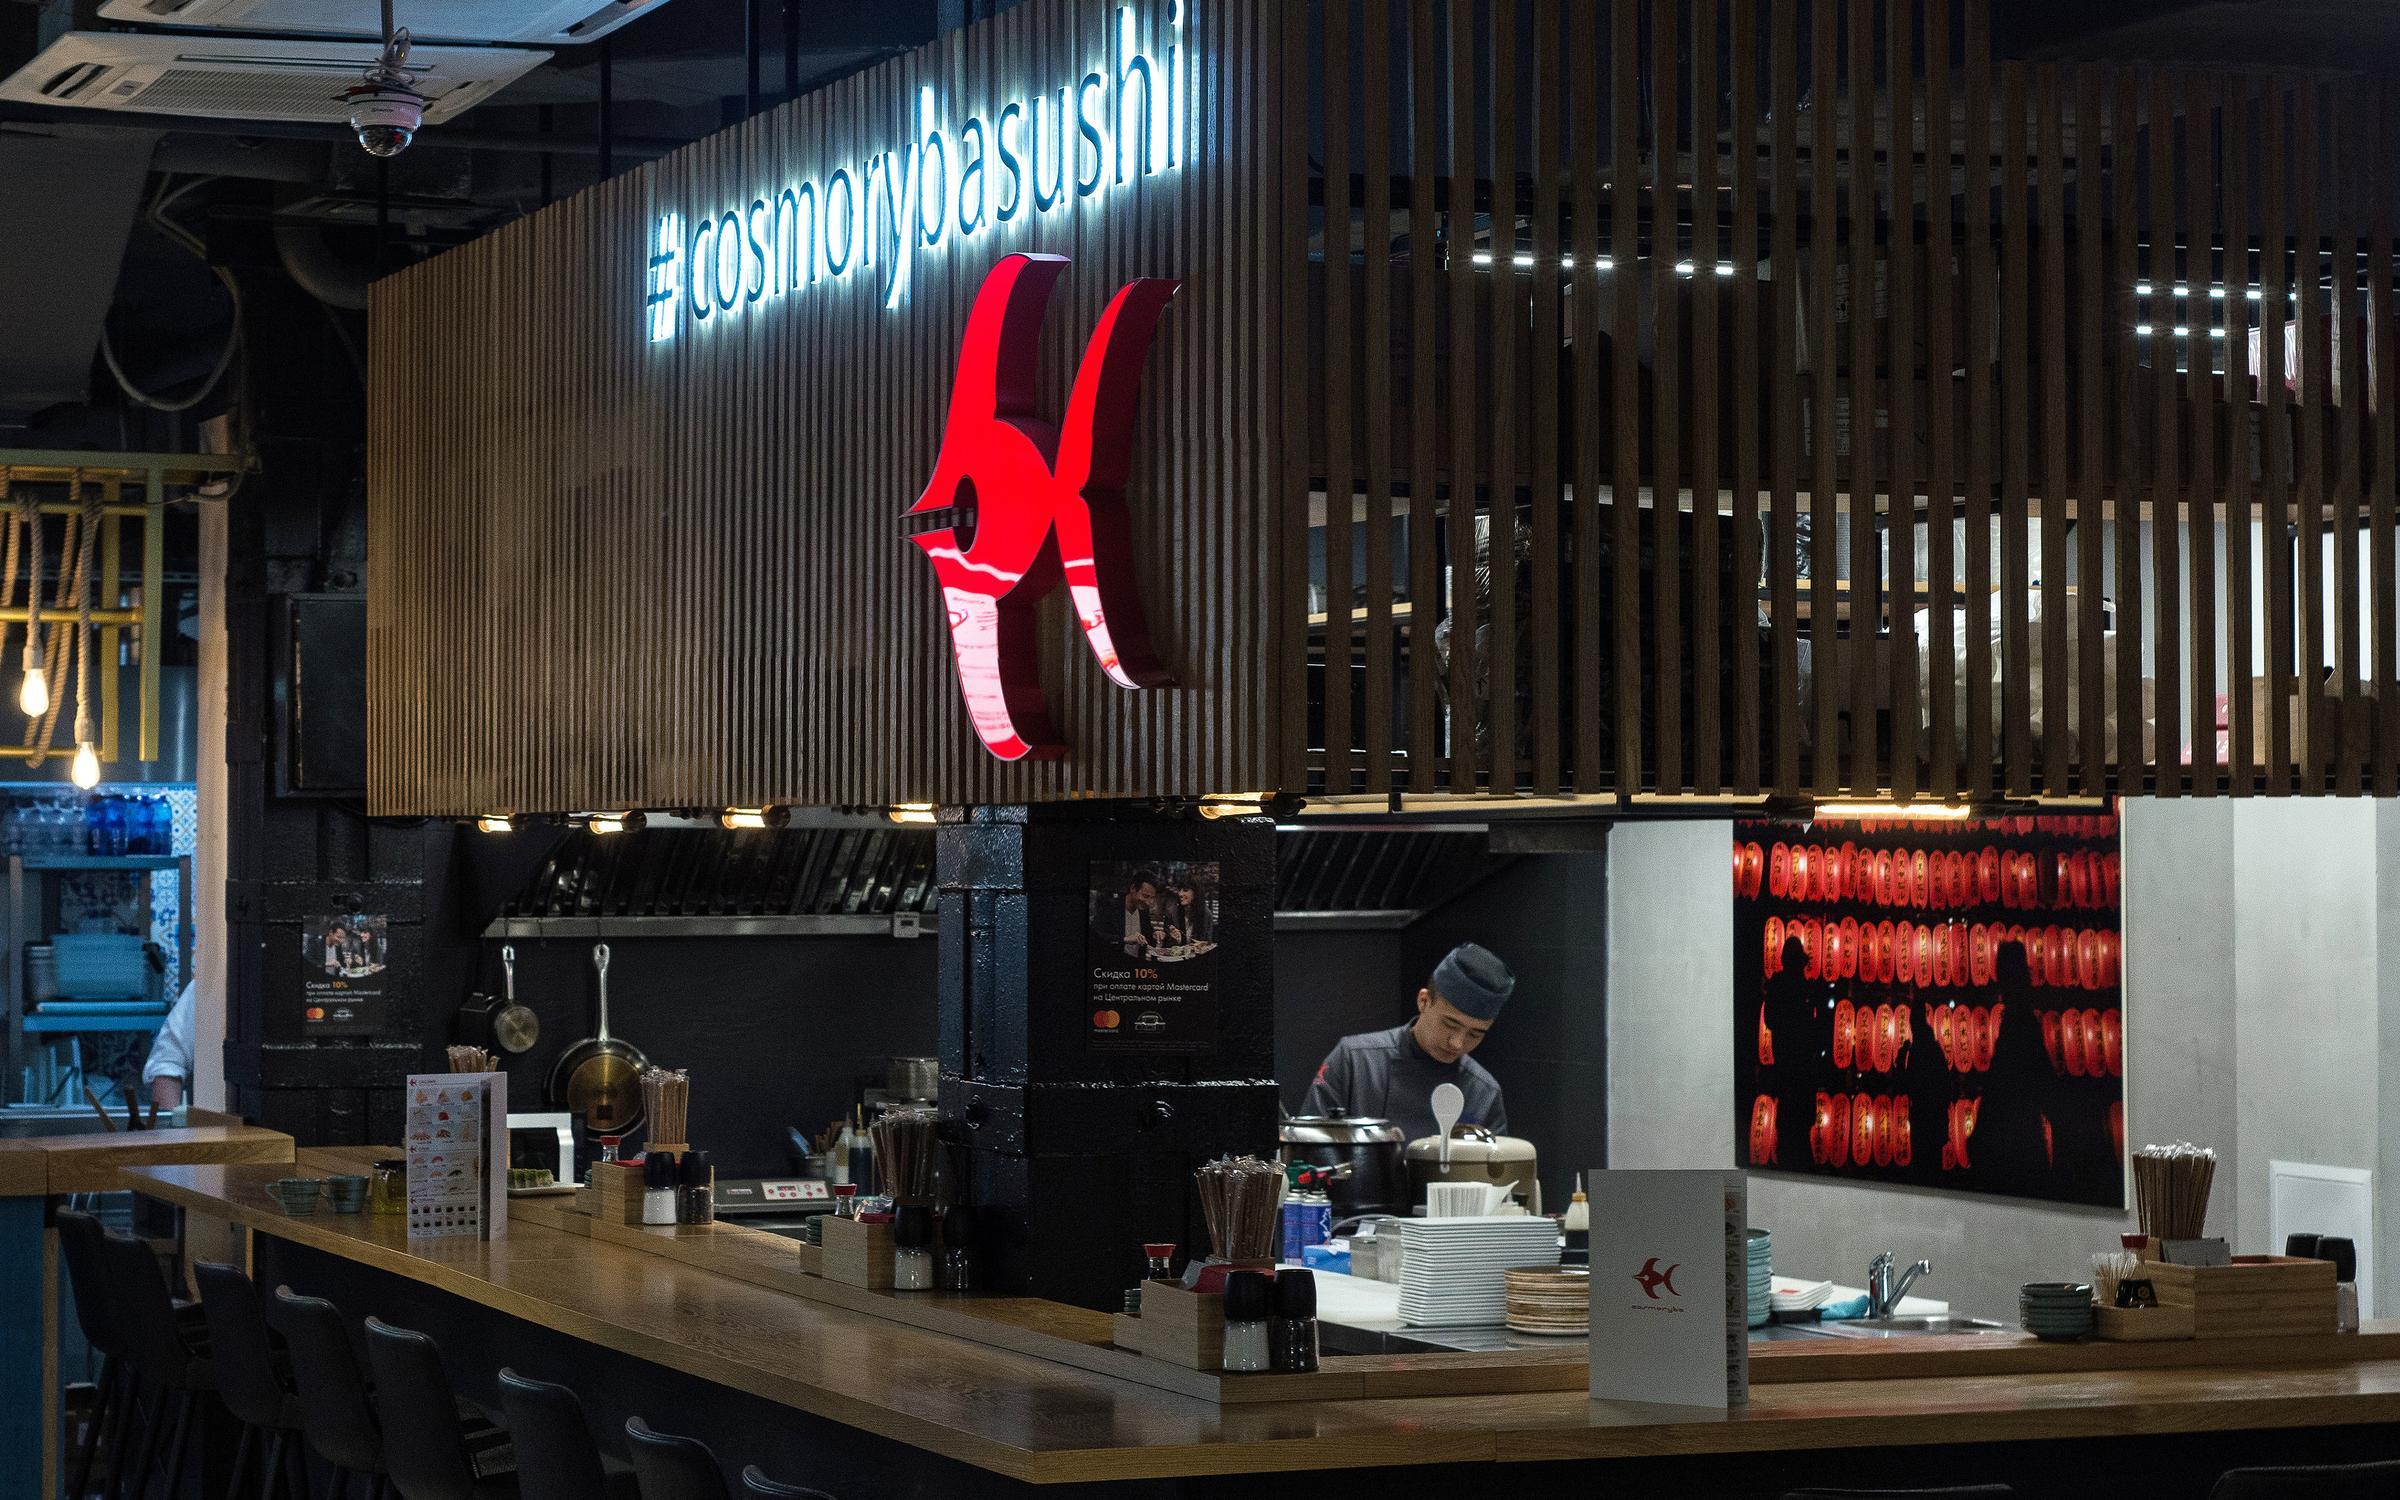 фотография Суши-бара Cosmoryba Sushi & Grill